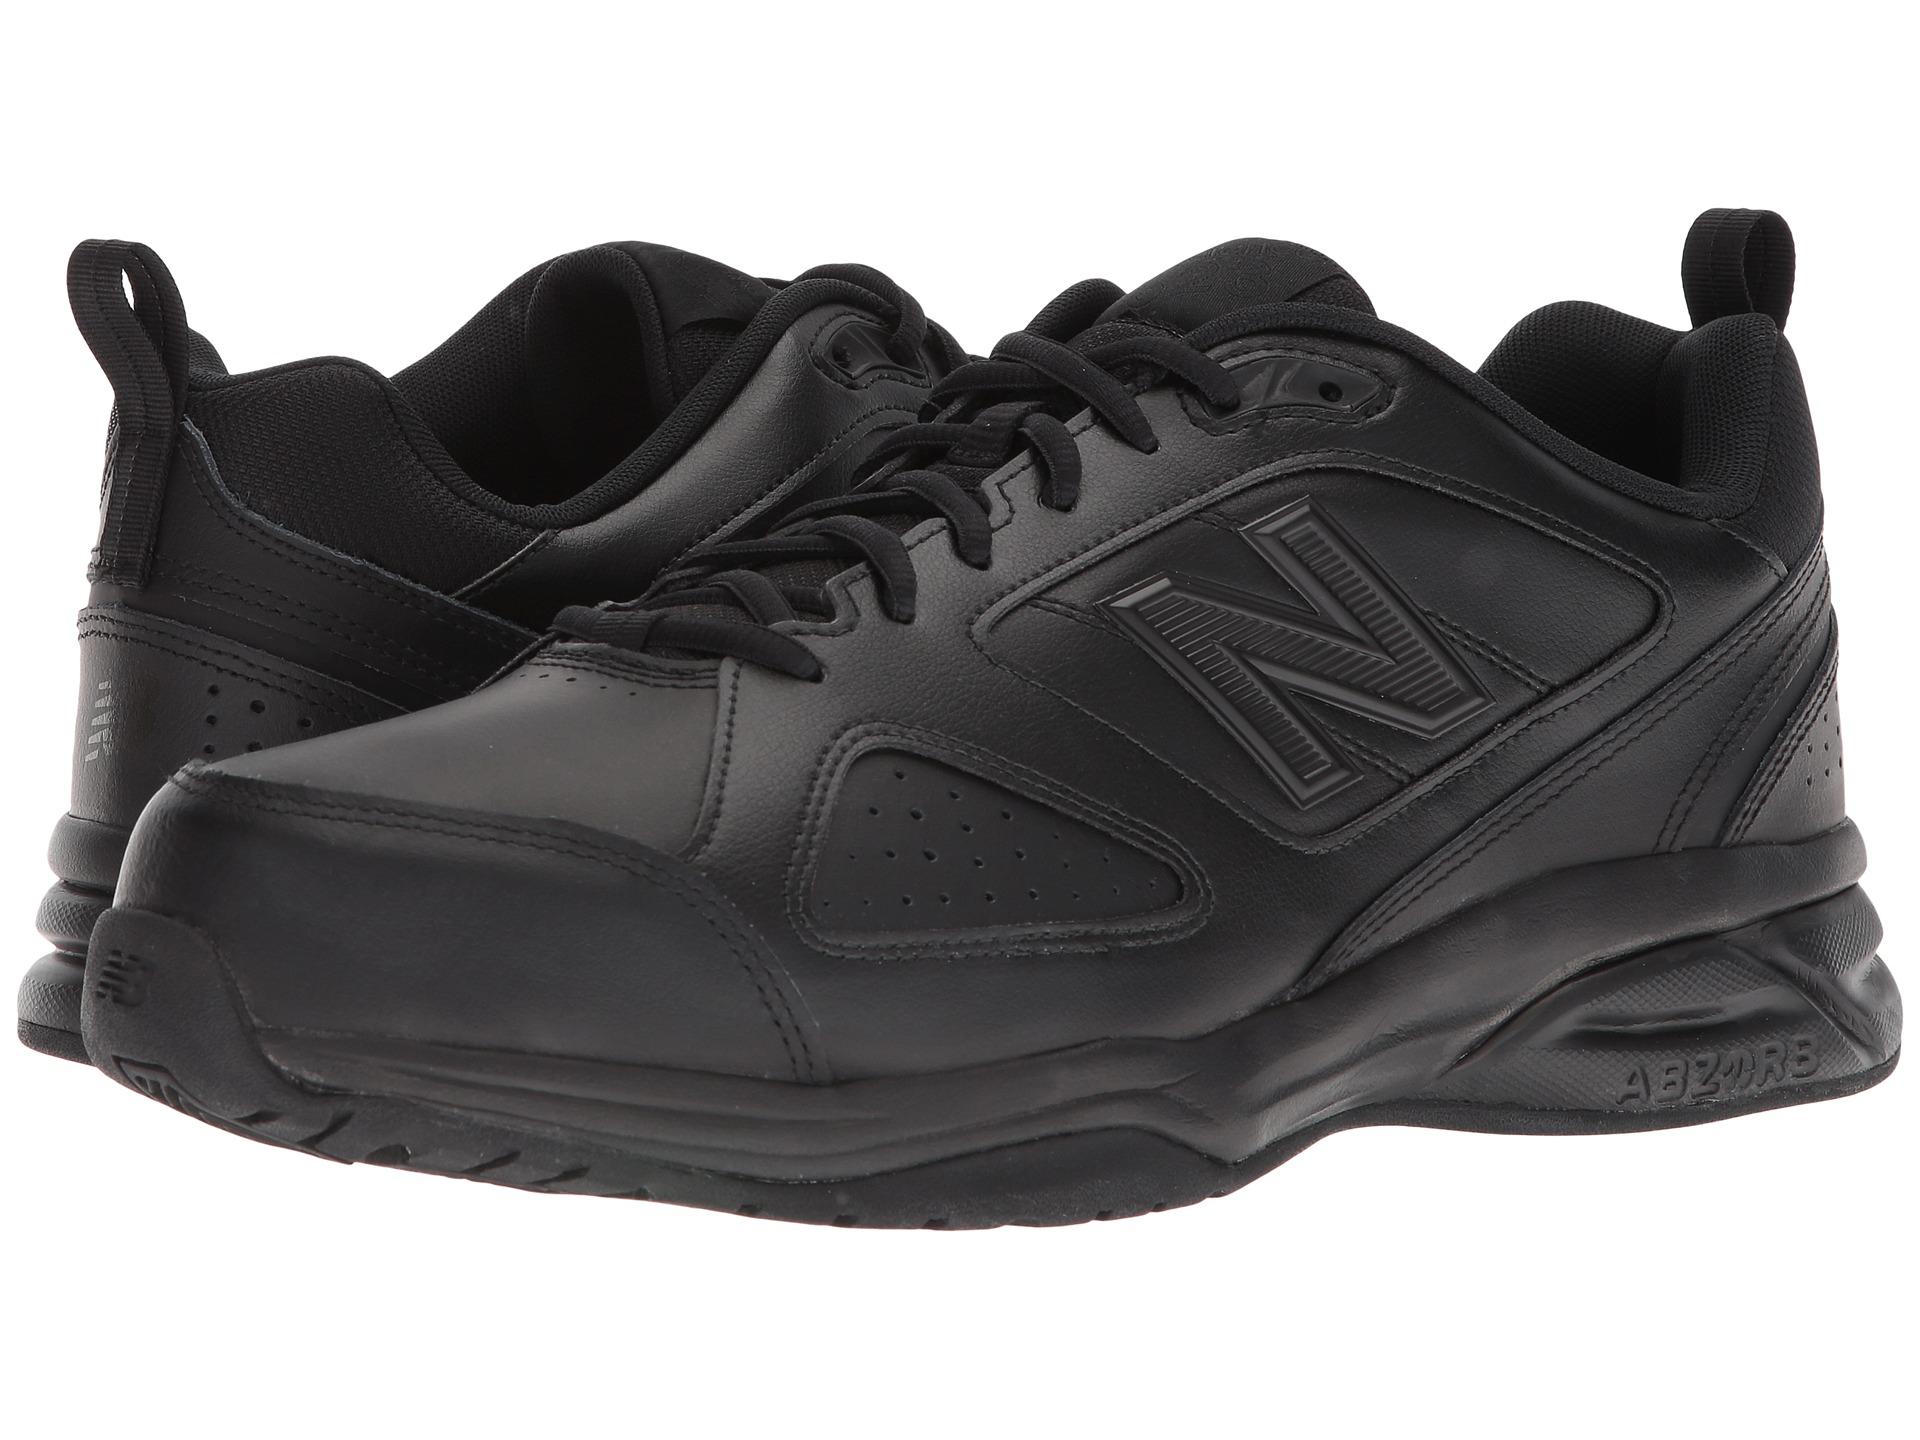 mens new balance grey & navy 999 trainers